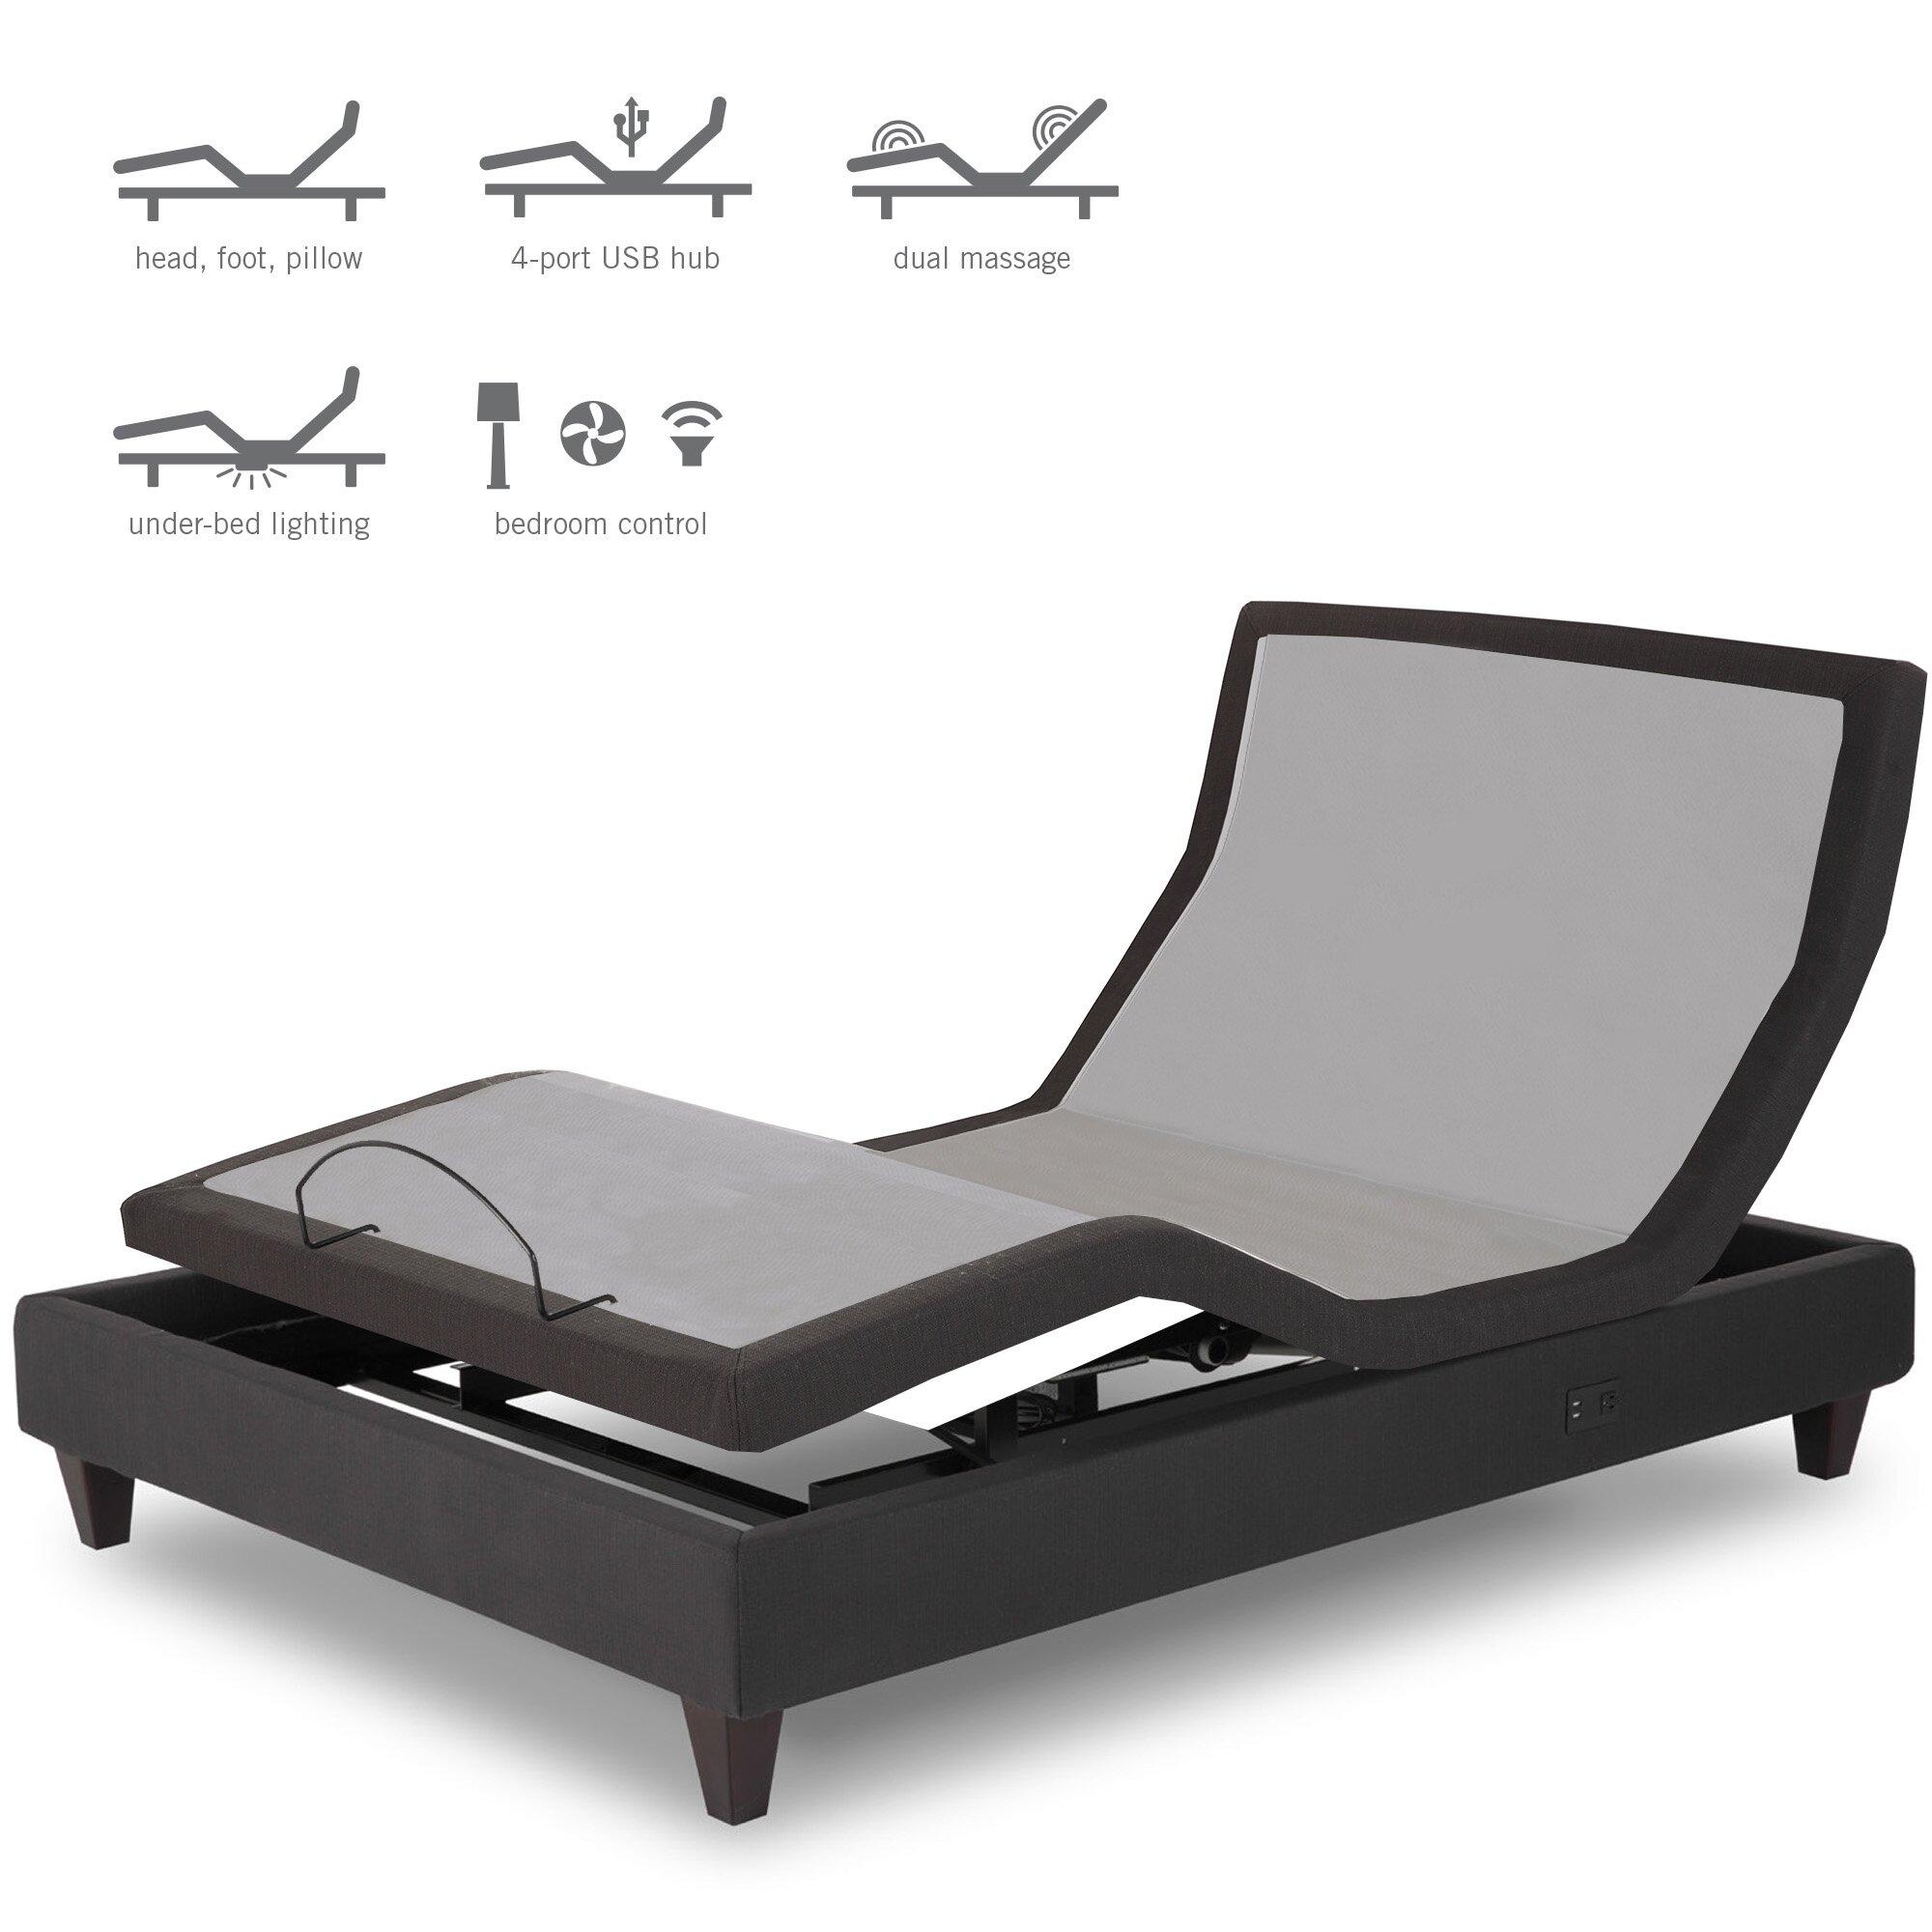 Adjustable Beds With Financing : Fashion bed group adjustable base wayfair